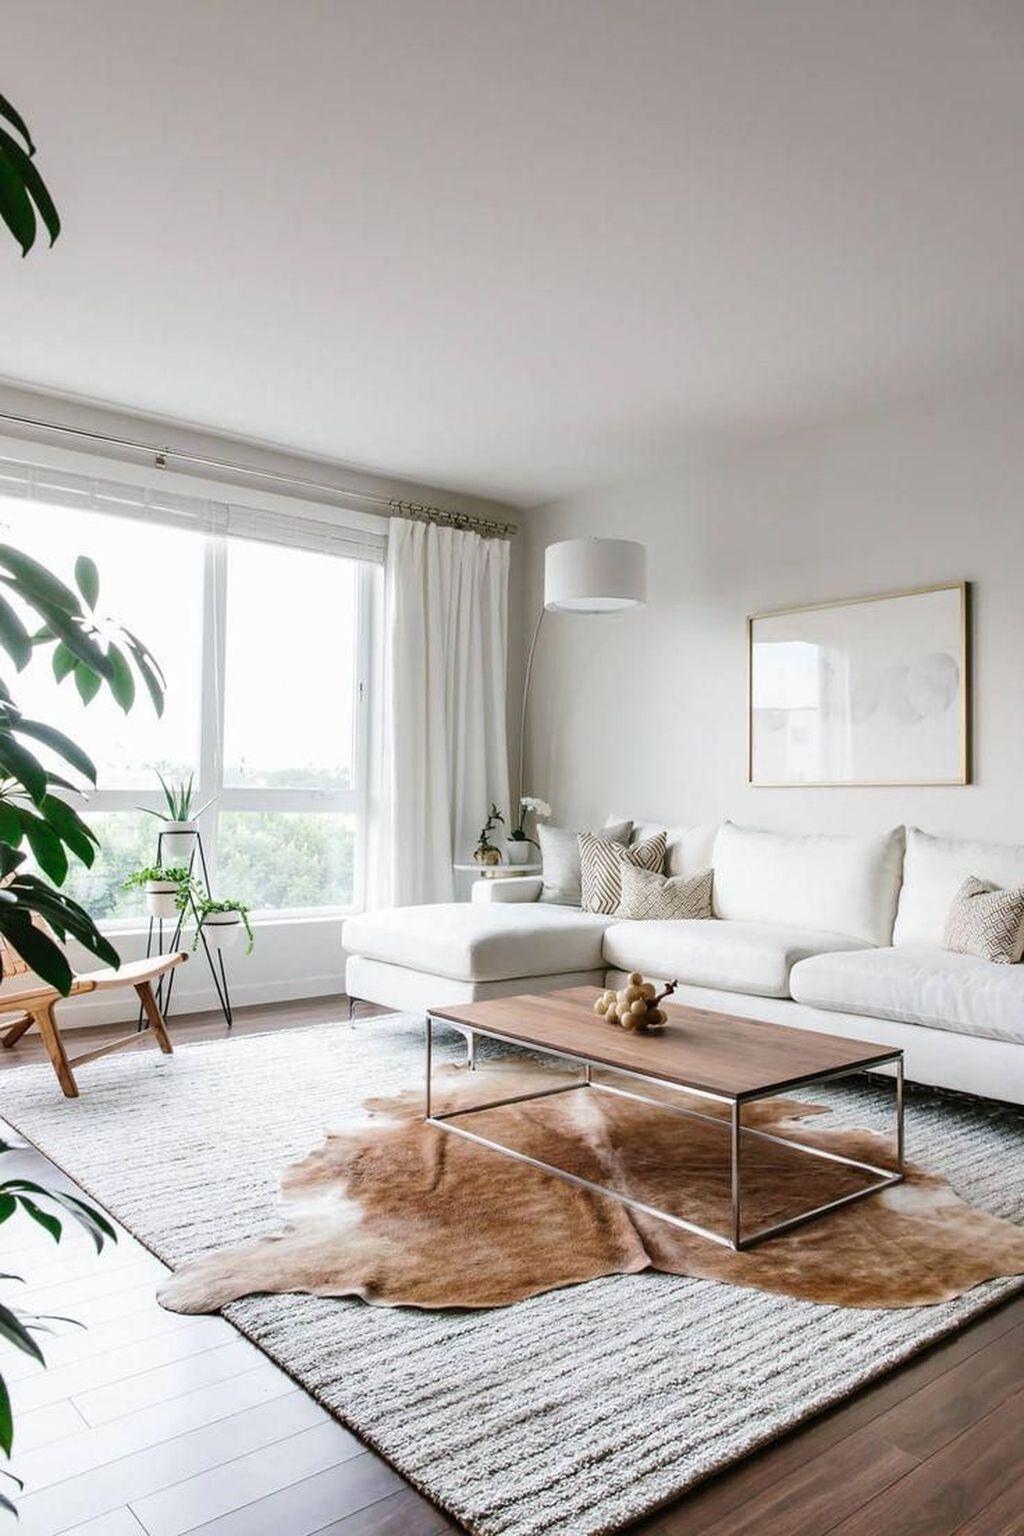 Awesome Modern Minimalist Home Decor Ideas 21